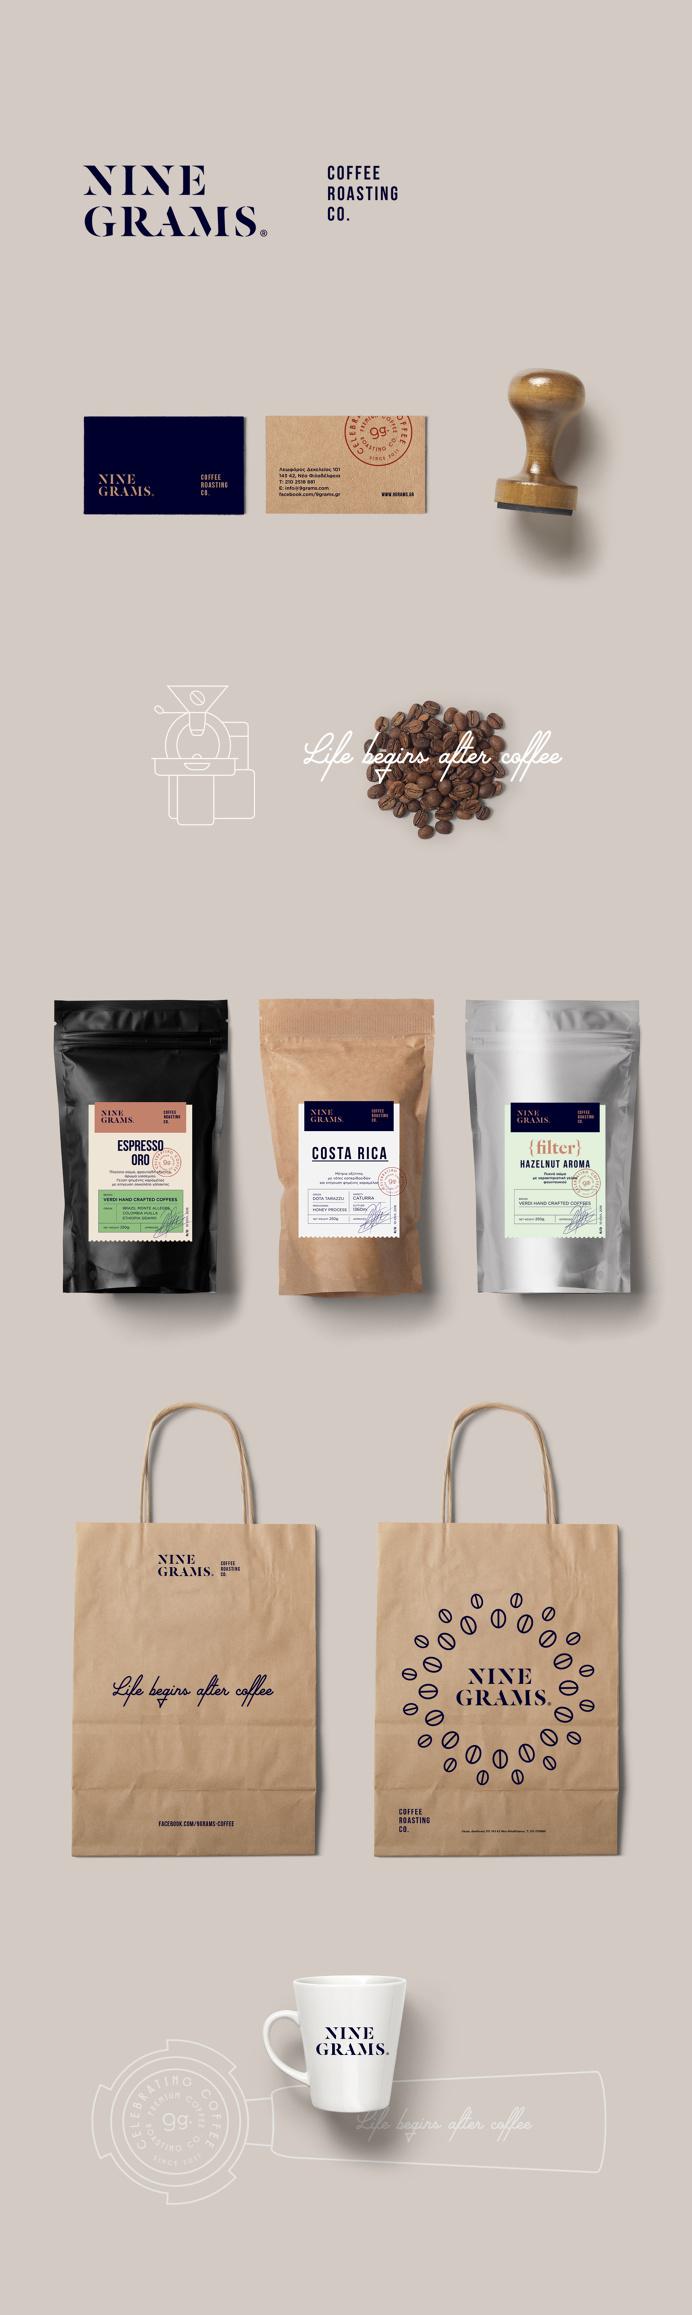 Nine Grams Coffee Roasting Co. on Behance